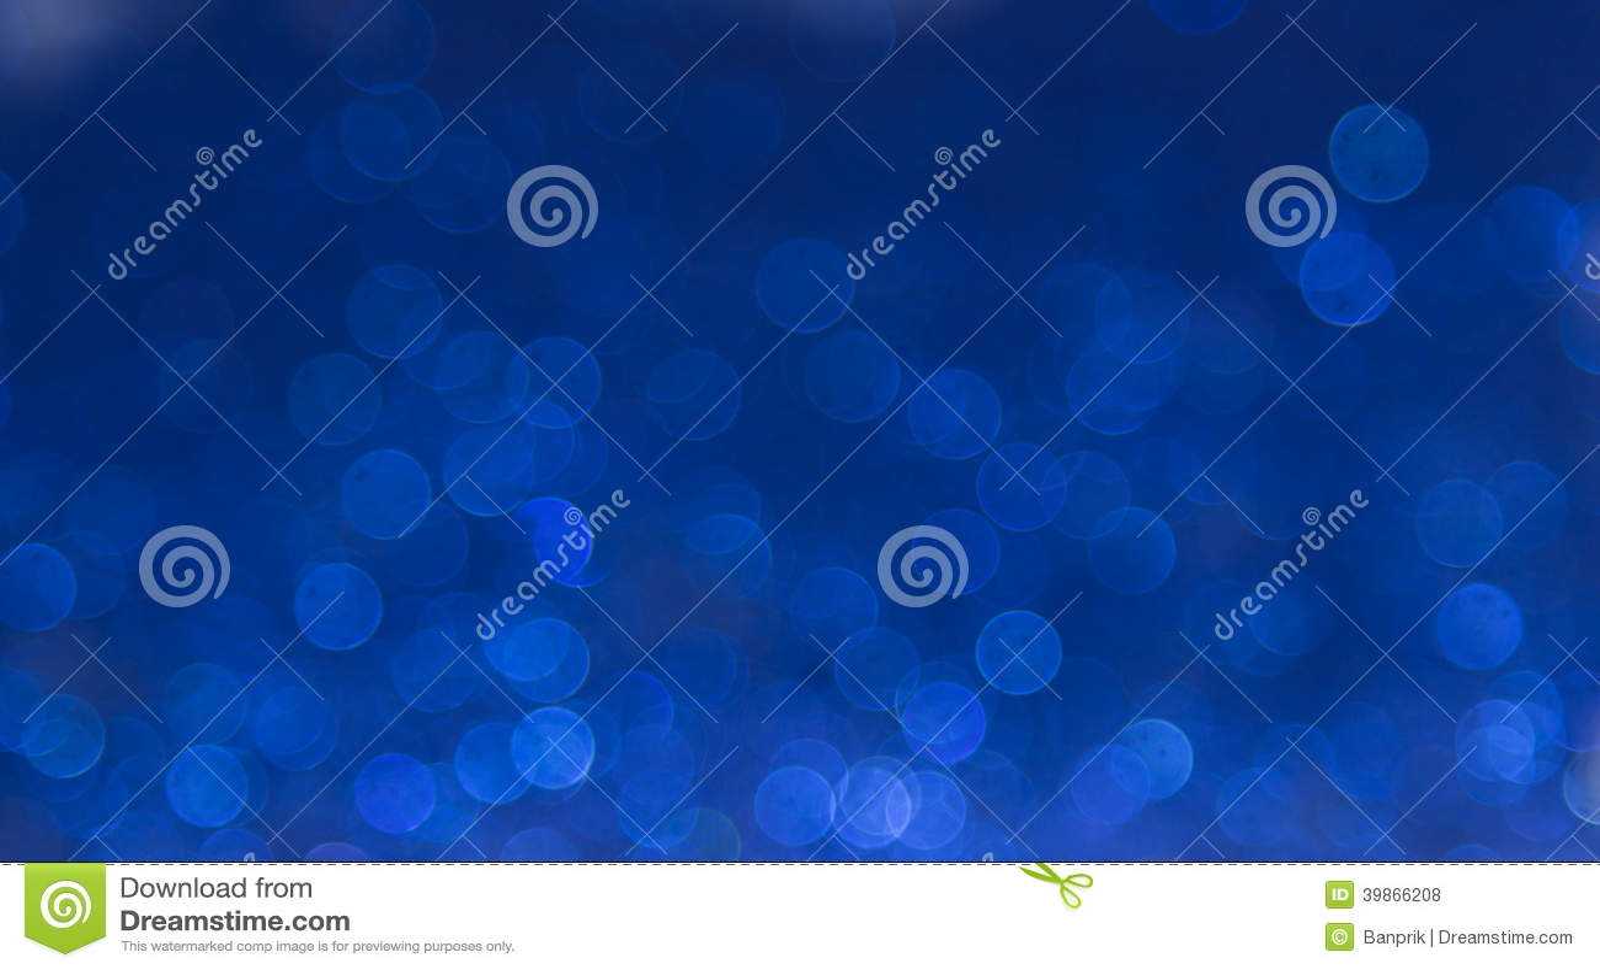 Blue elegant abstract bokeh background